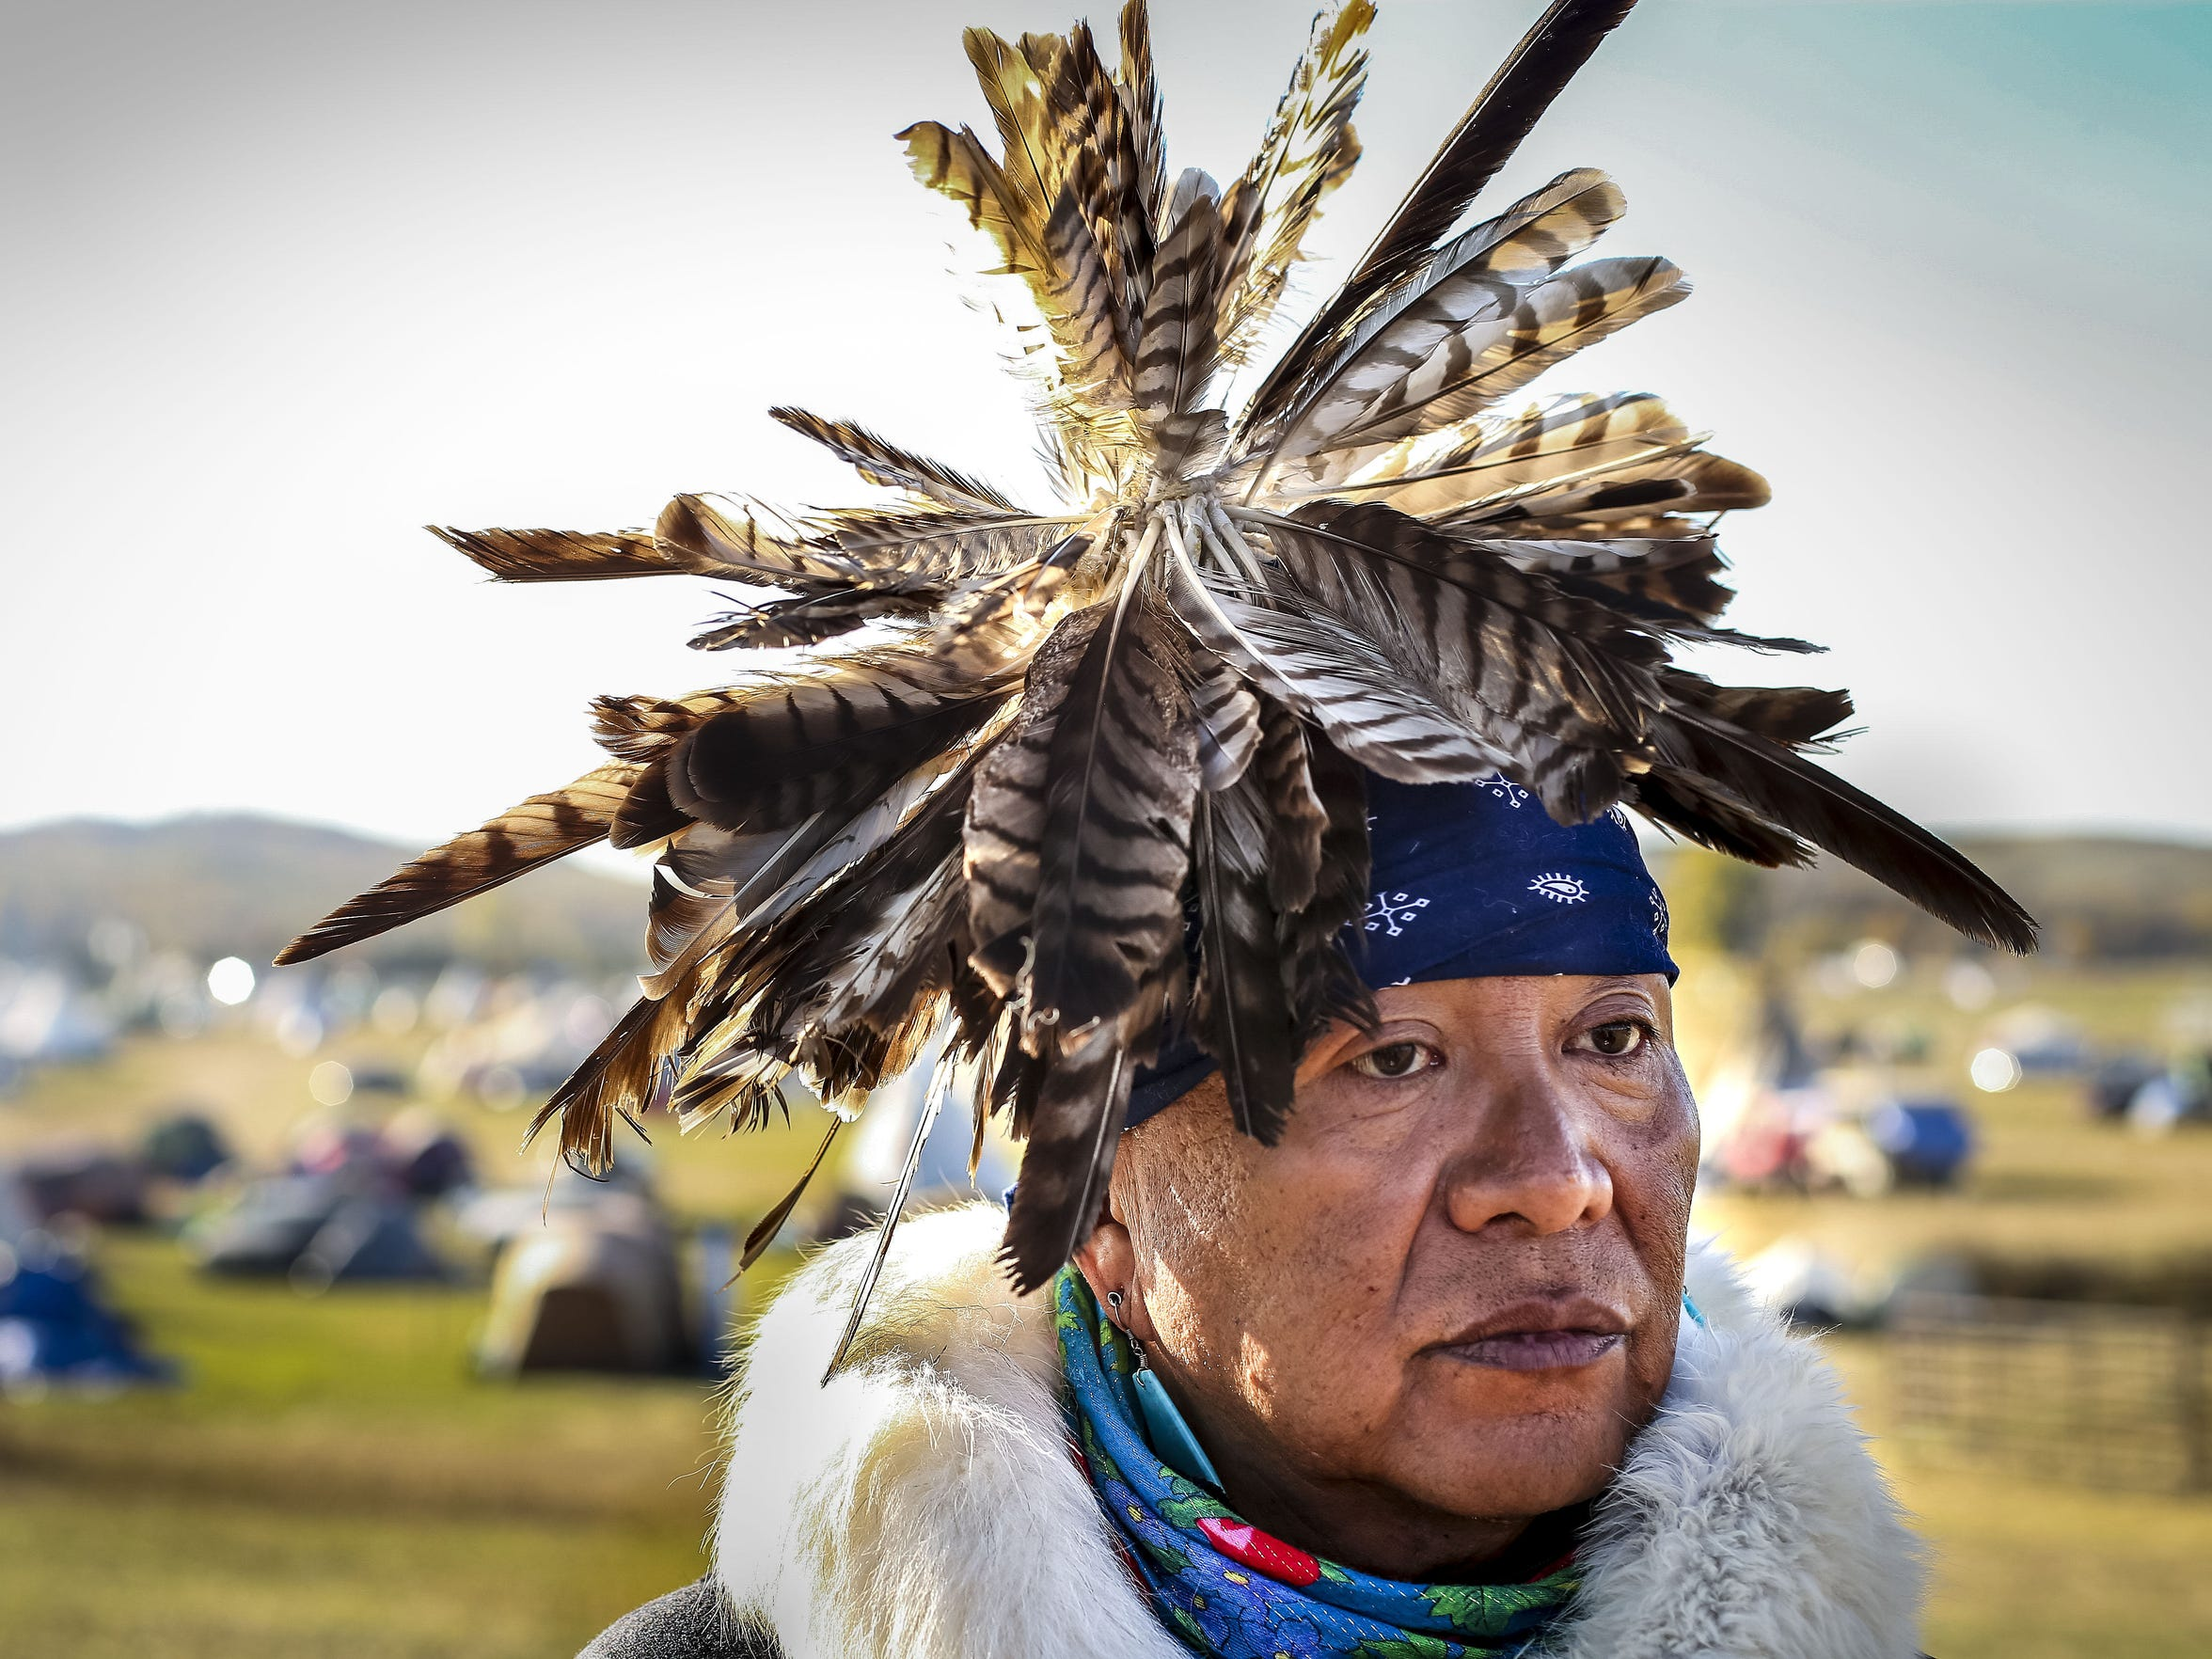 Havasupai tribal medicine man Uqualla, shown at the